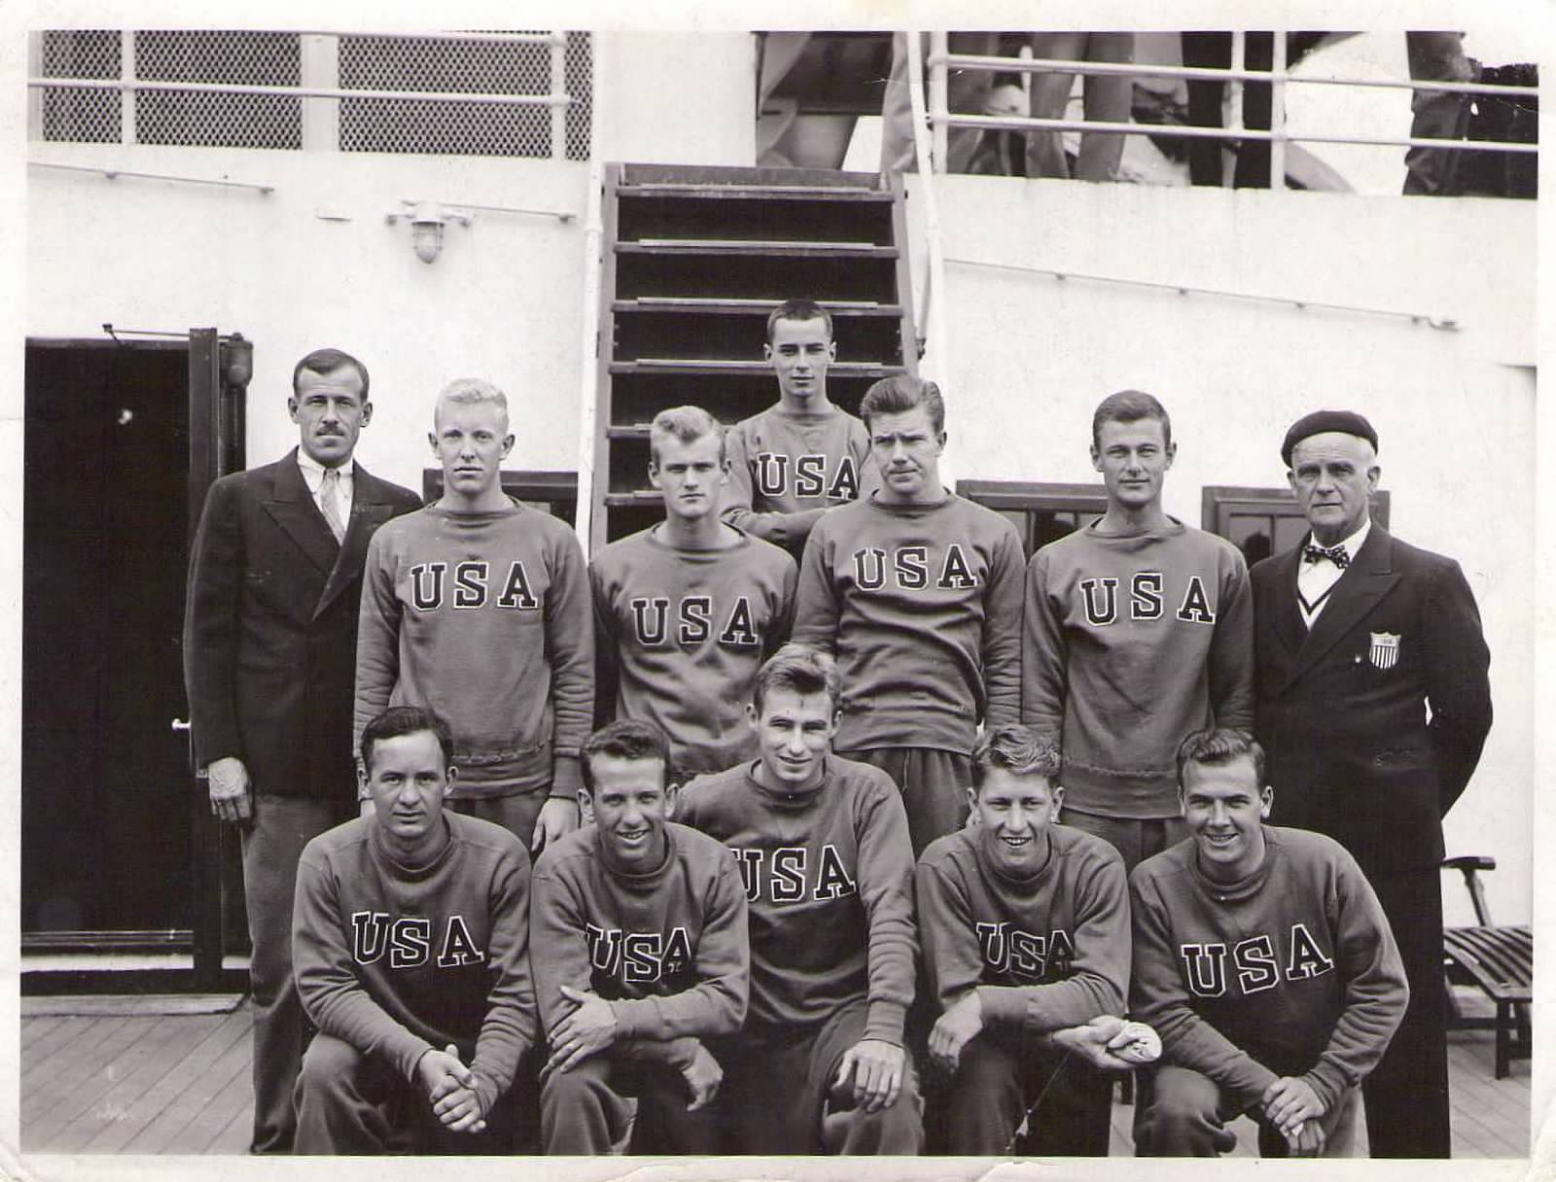 Eugene Fruehauf olympic games berlin 1936, olympic handbook